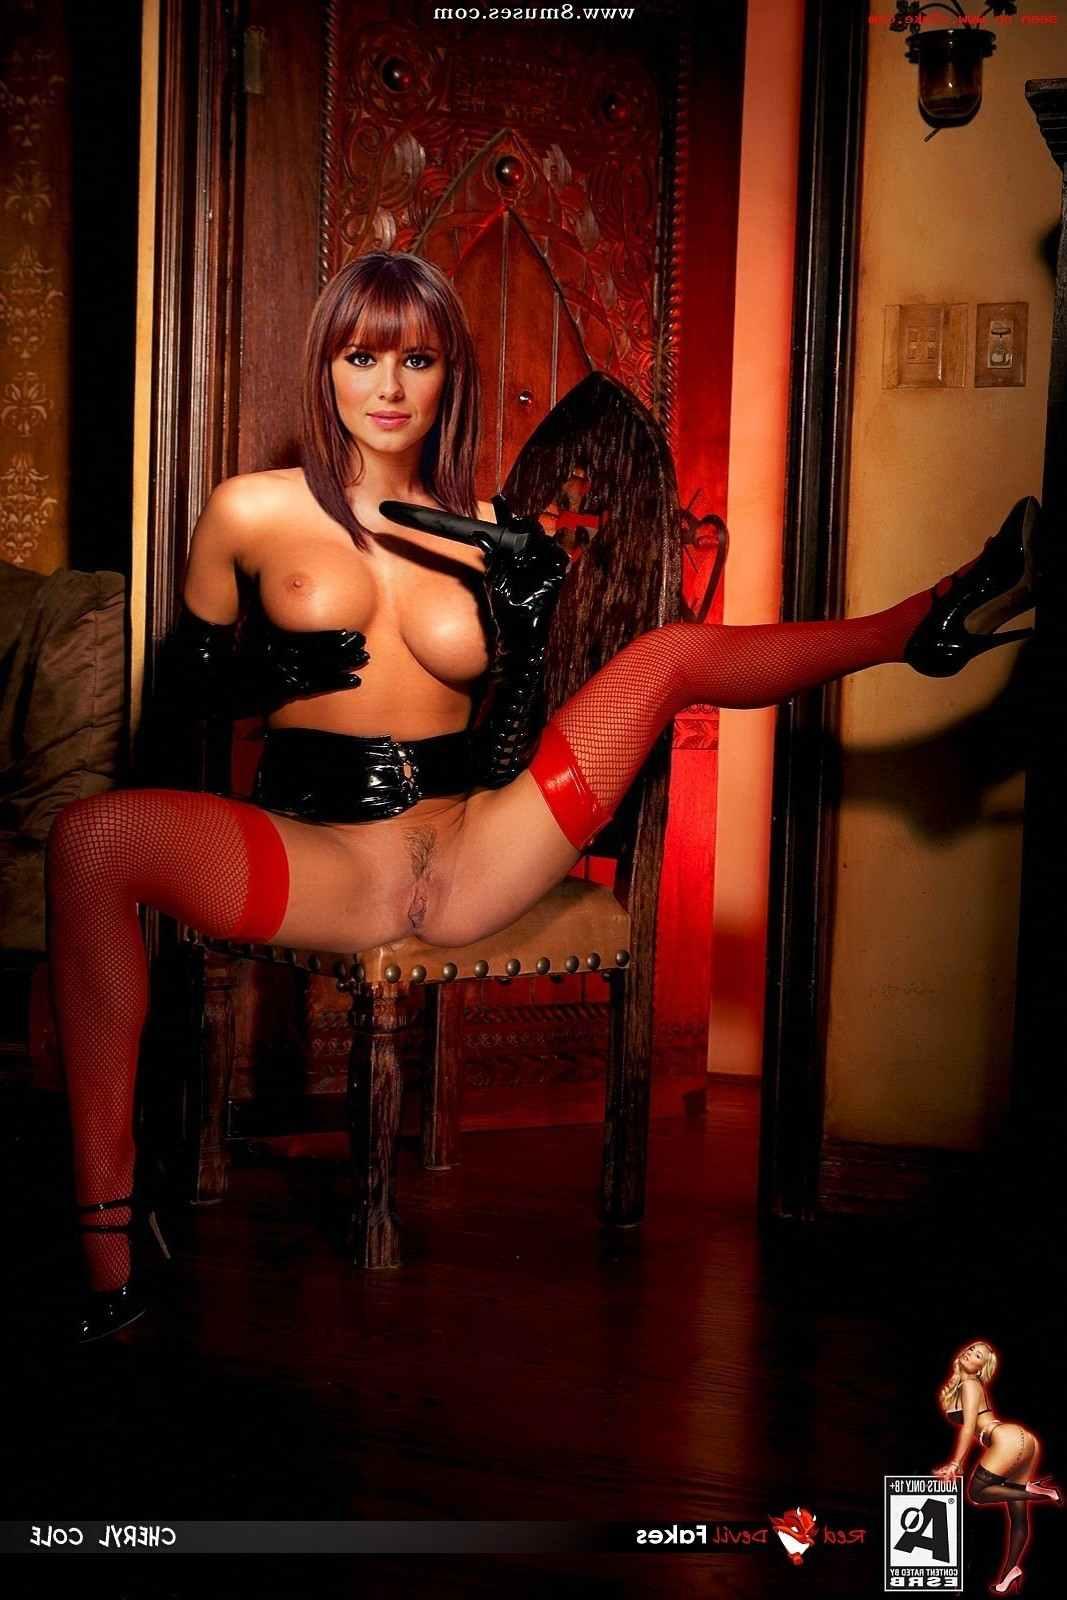 Fake-Celebrities-Sex-Pictures/Cheryl-Tweedy Cheryl__Tweedy__8muses_-_Sex_and_Porn_Comics_78.jpg